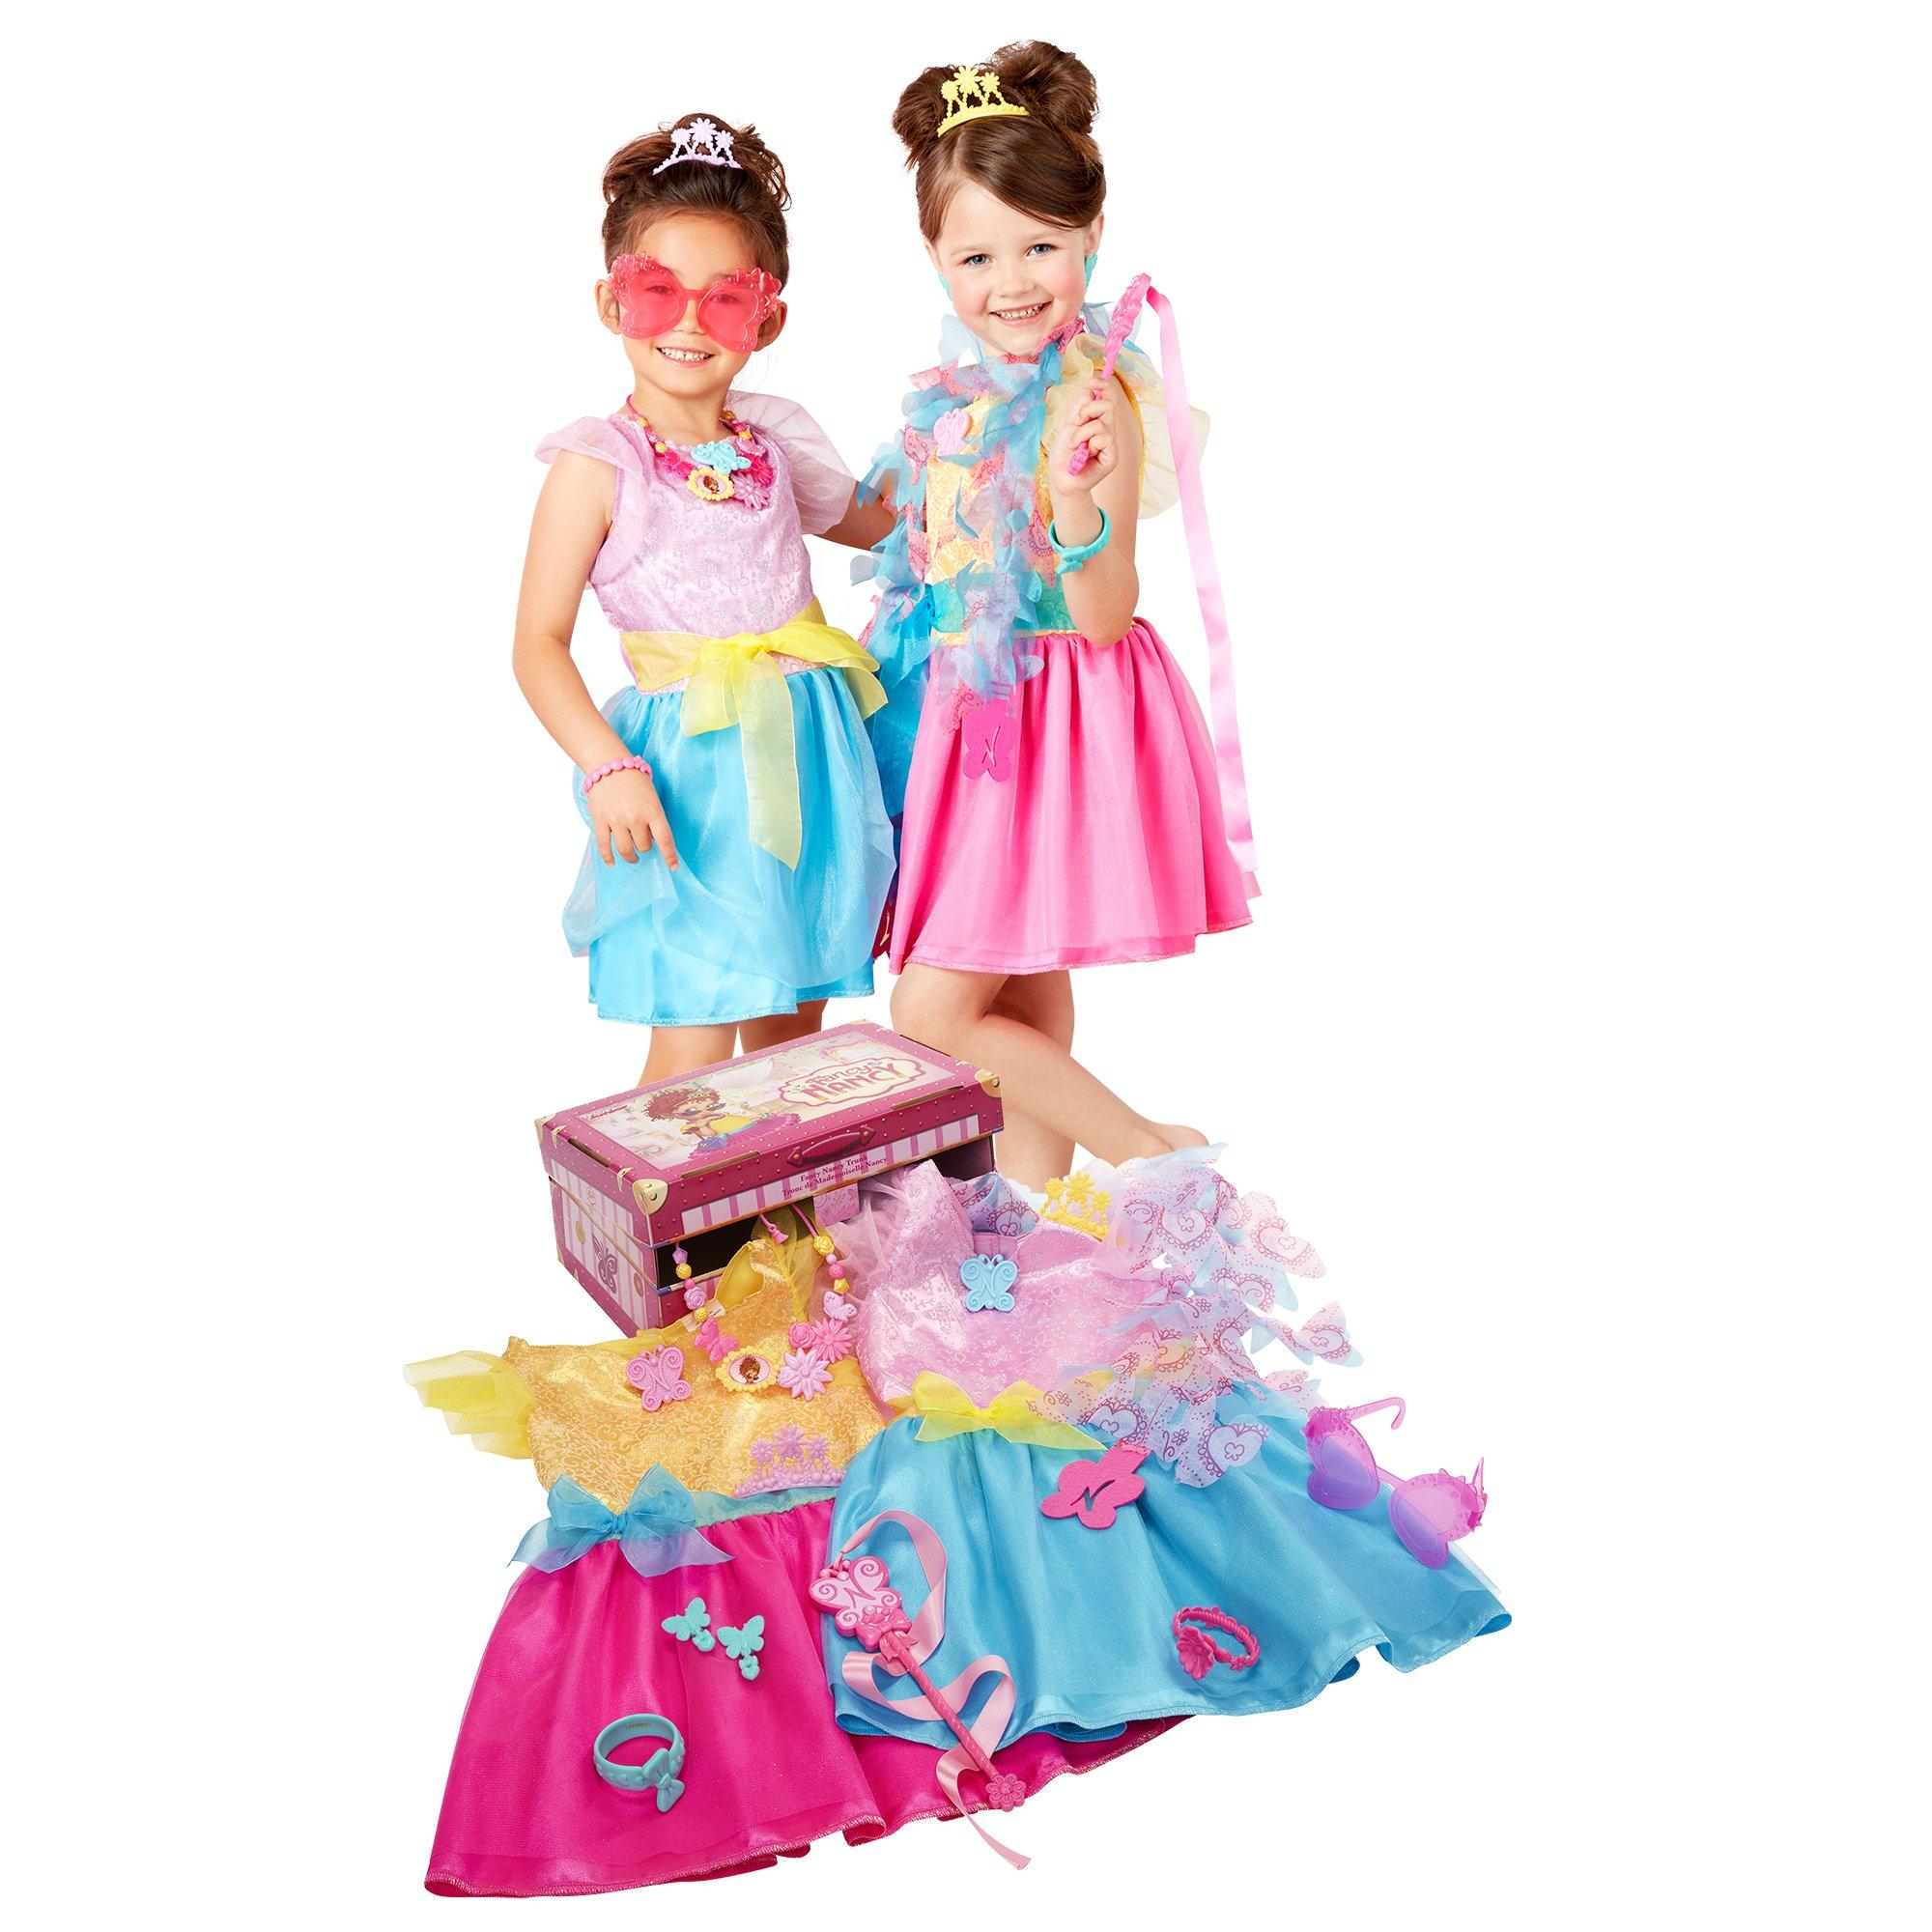 Fancy Nancy Ultimate Dress-Up Trunk, 13-Pieces, Fits Sizes 4-6X [Amazon Exclusive] by Fancy Nancy (Image #1)